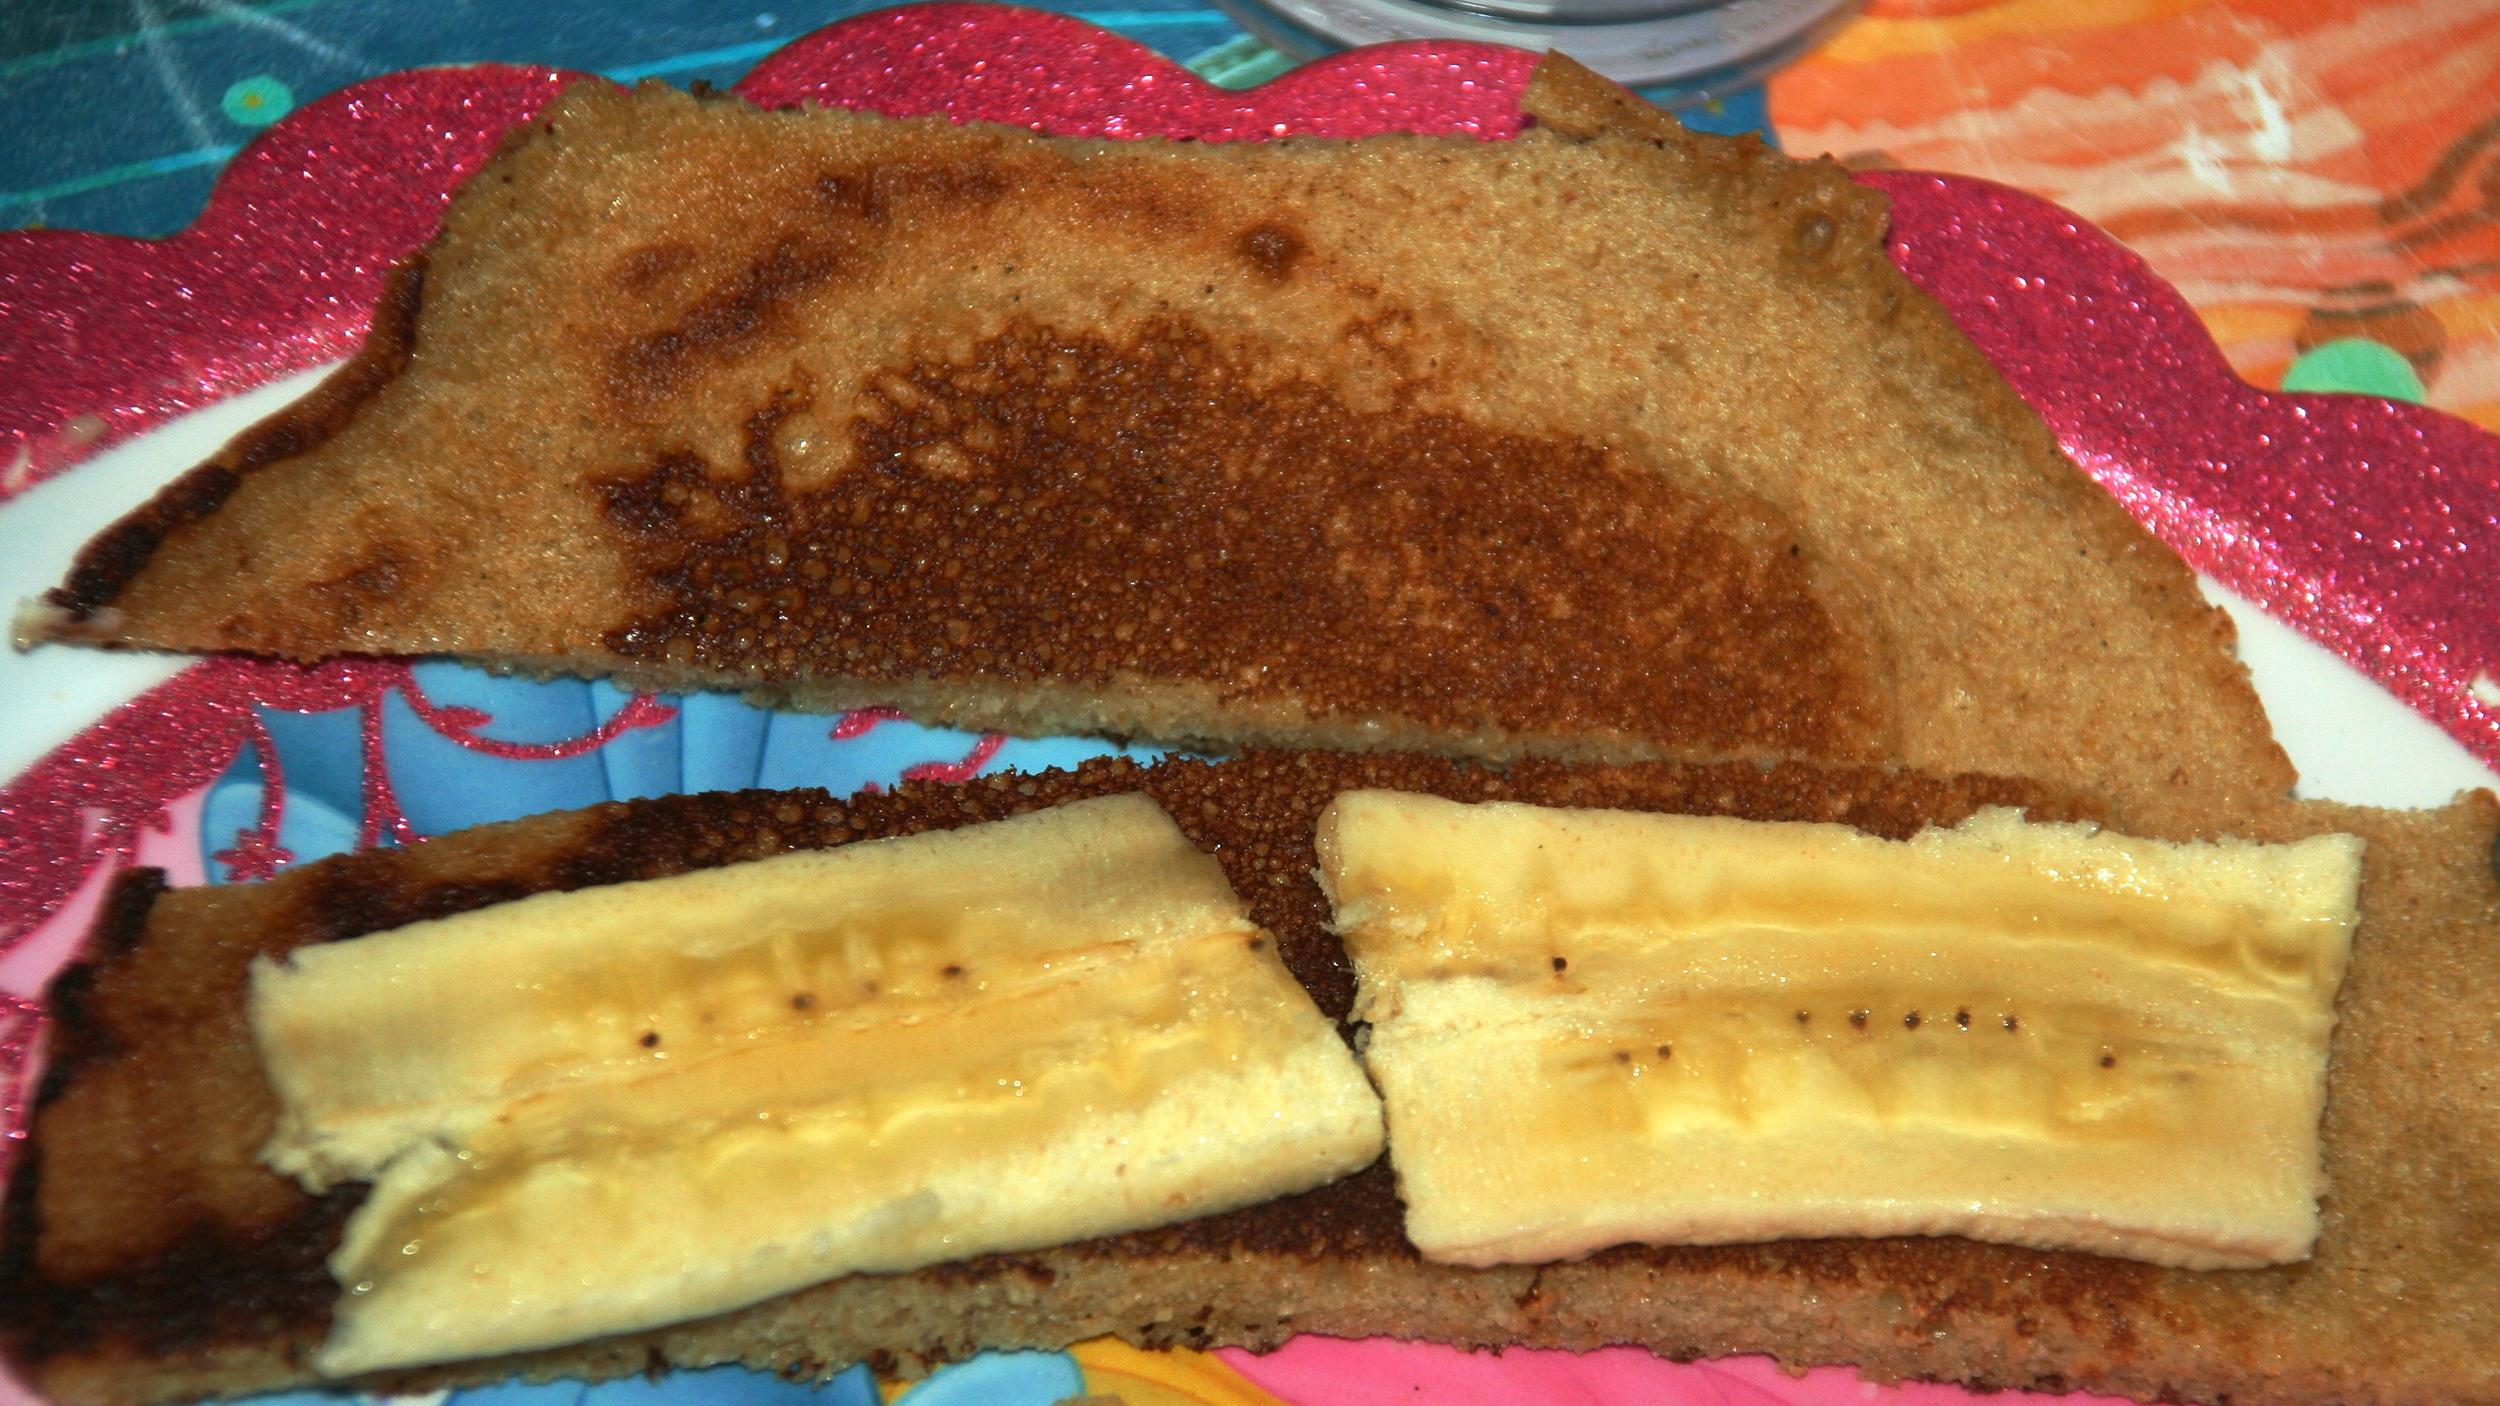 Place sliced bananas on top of pancake strips